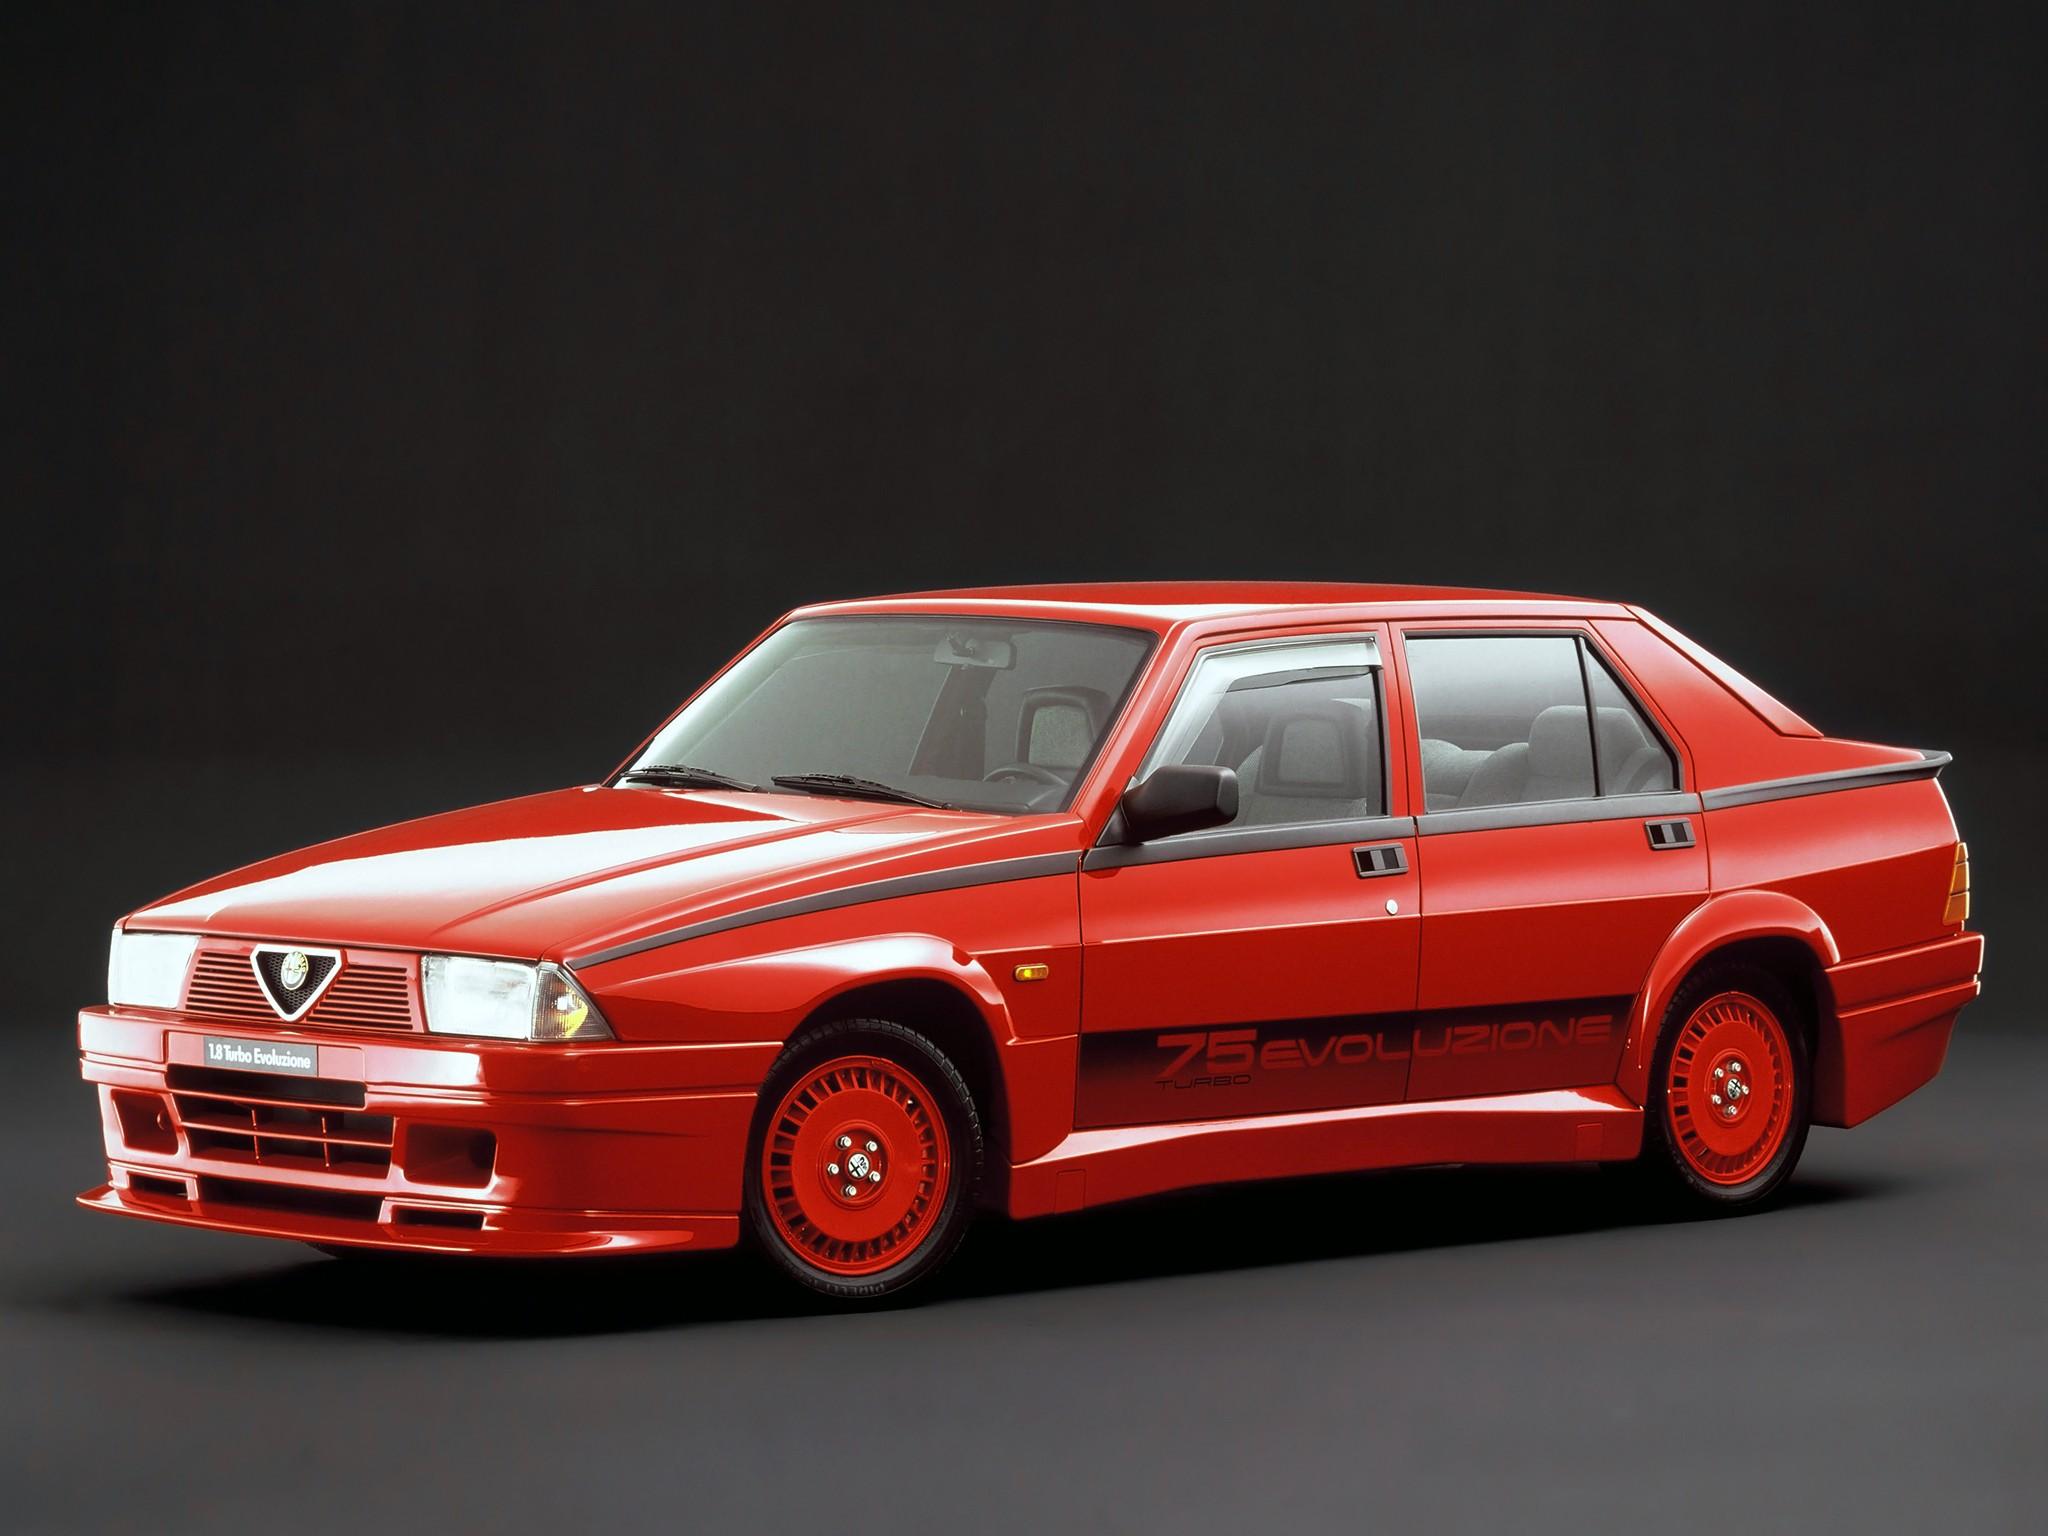 Alfa Romeo 75 Wiring Diagram Most Uptodate Info Twin Spark Specs Photos 1985 1986 1987 1988 1989 1990 Rh Autoevolution Com Alfetta Diagrams Class A Rv